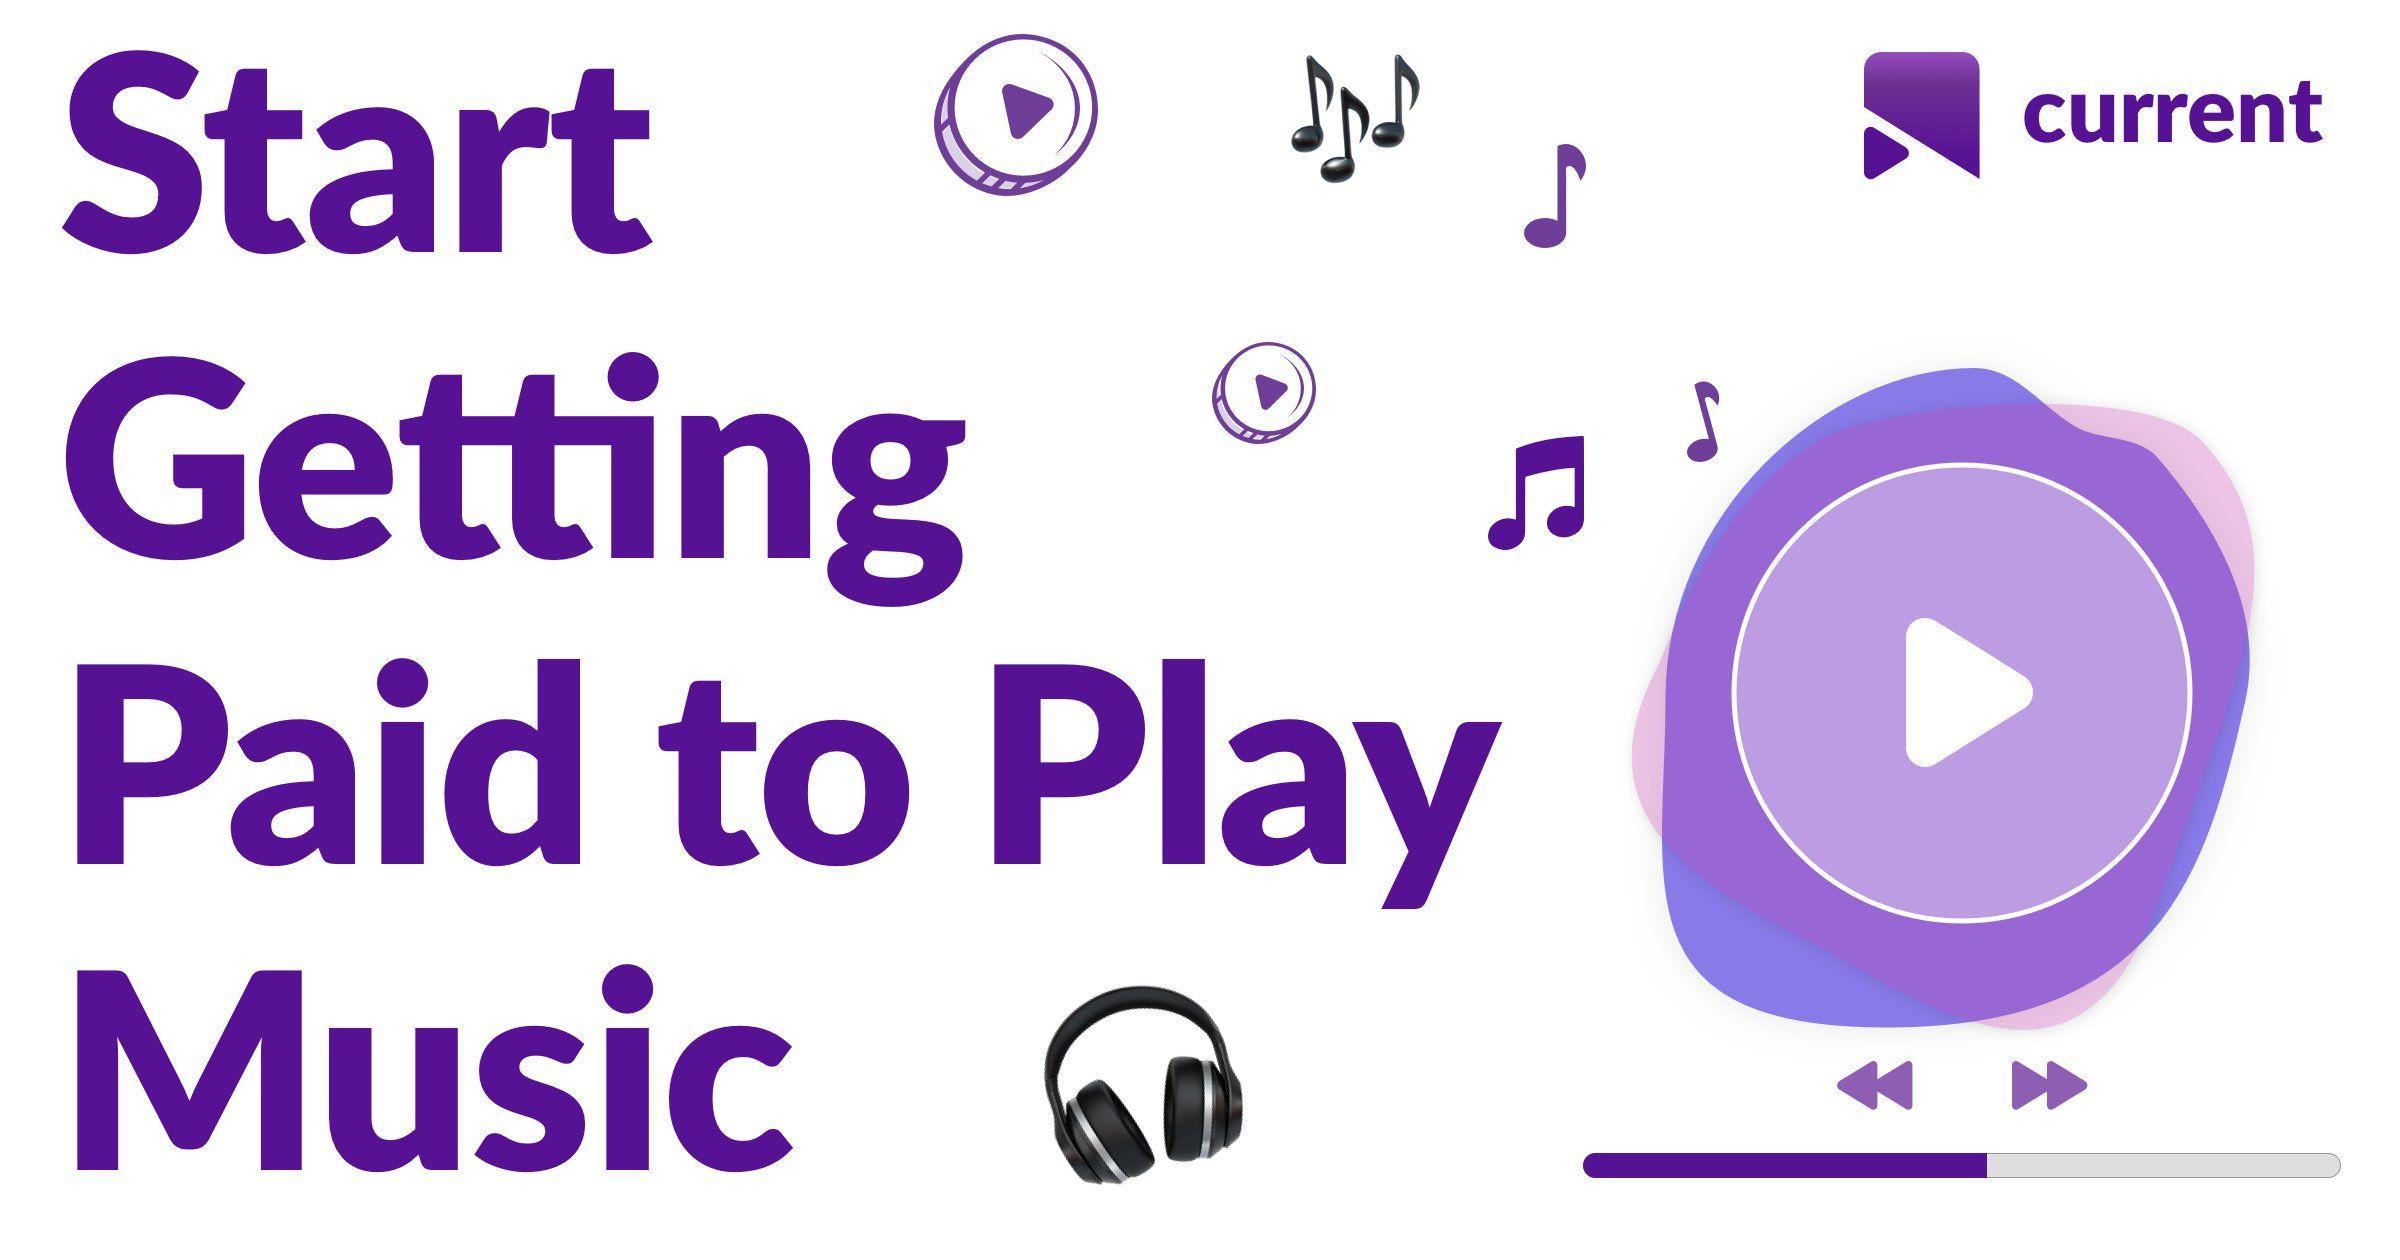 Freeearningapp currentmusic listen to music and earn